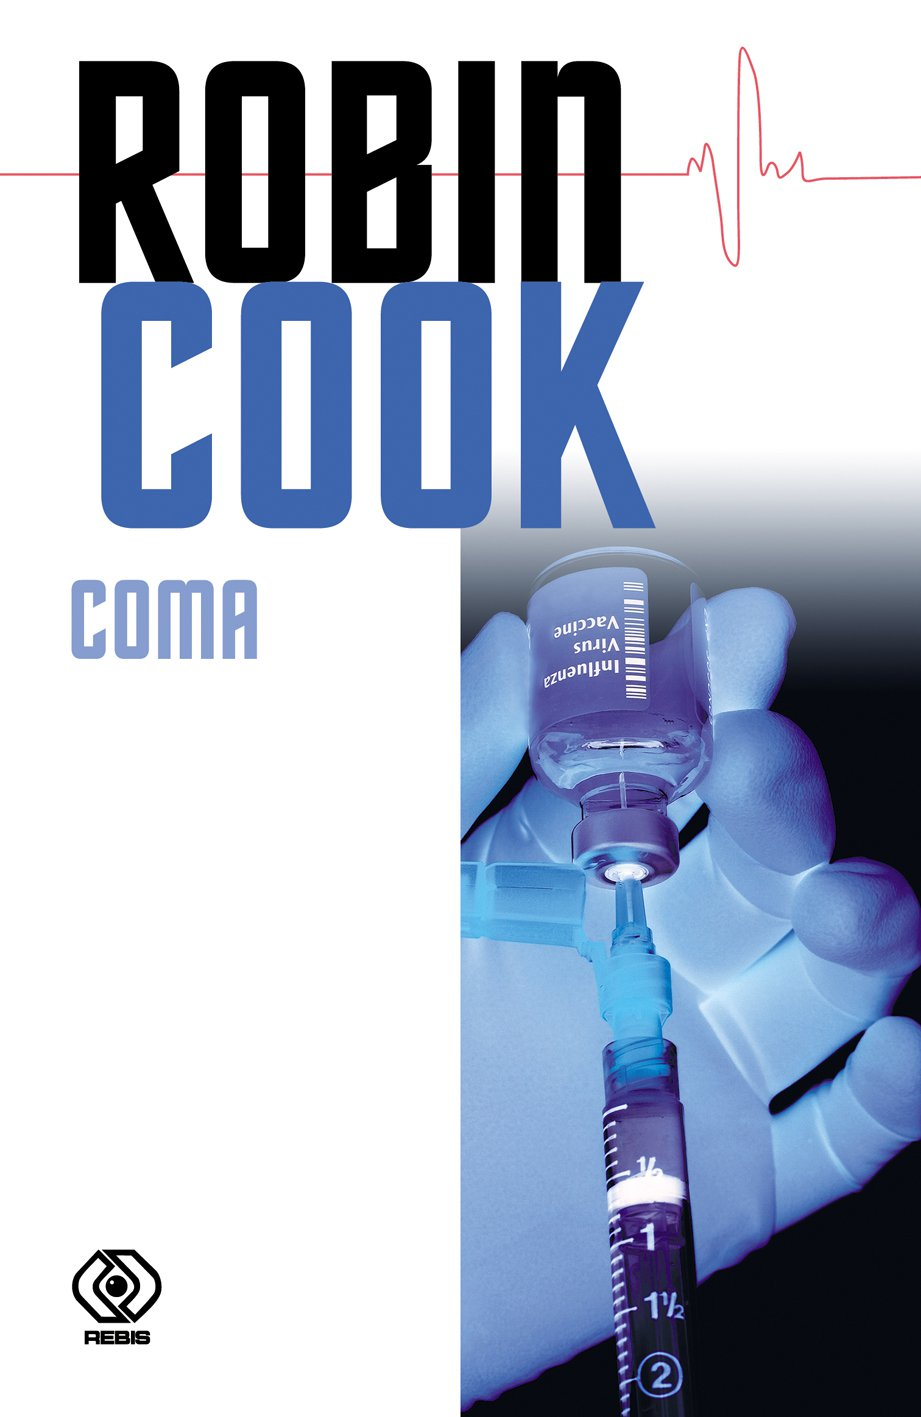 Coma - Ebook (Książka EPUB) do pobrania w formacie EPUB